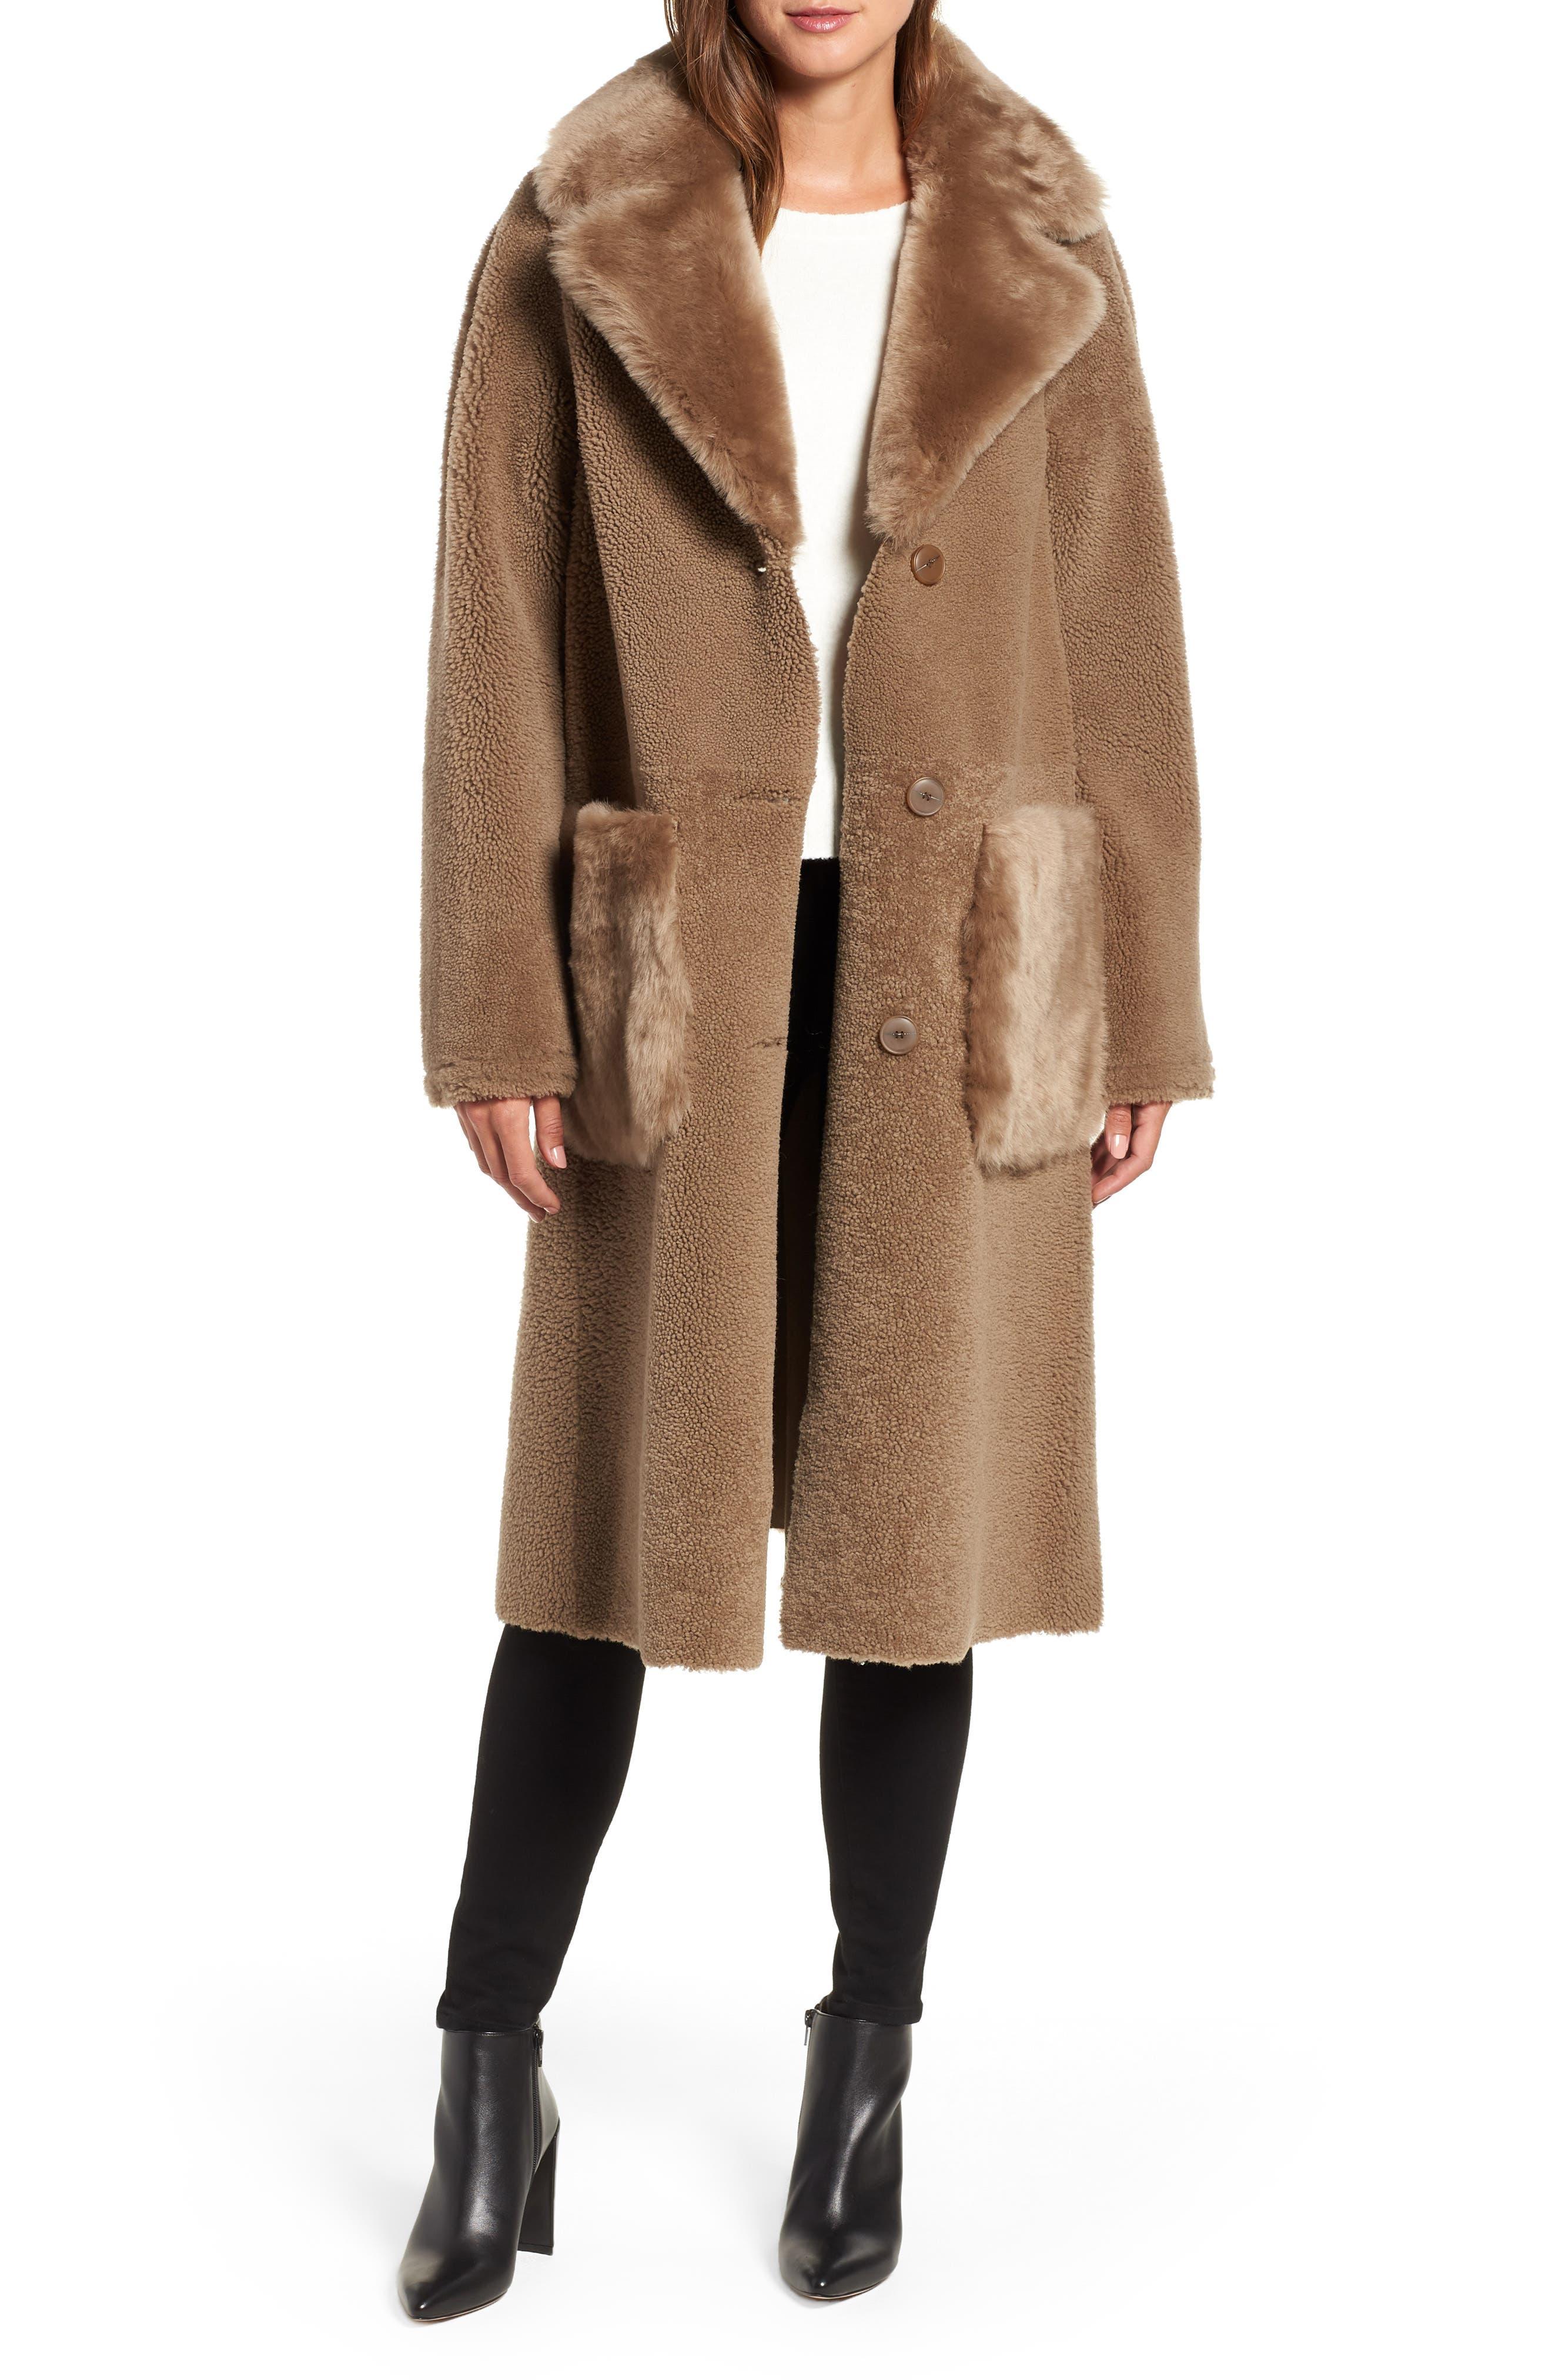 HISO,                             Genuine Merino Shearling Coat,                             Main thumbnail 1, color,                             250